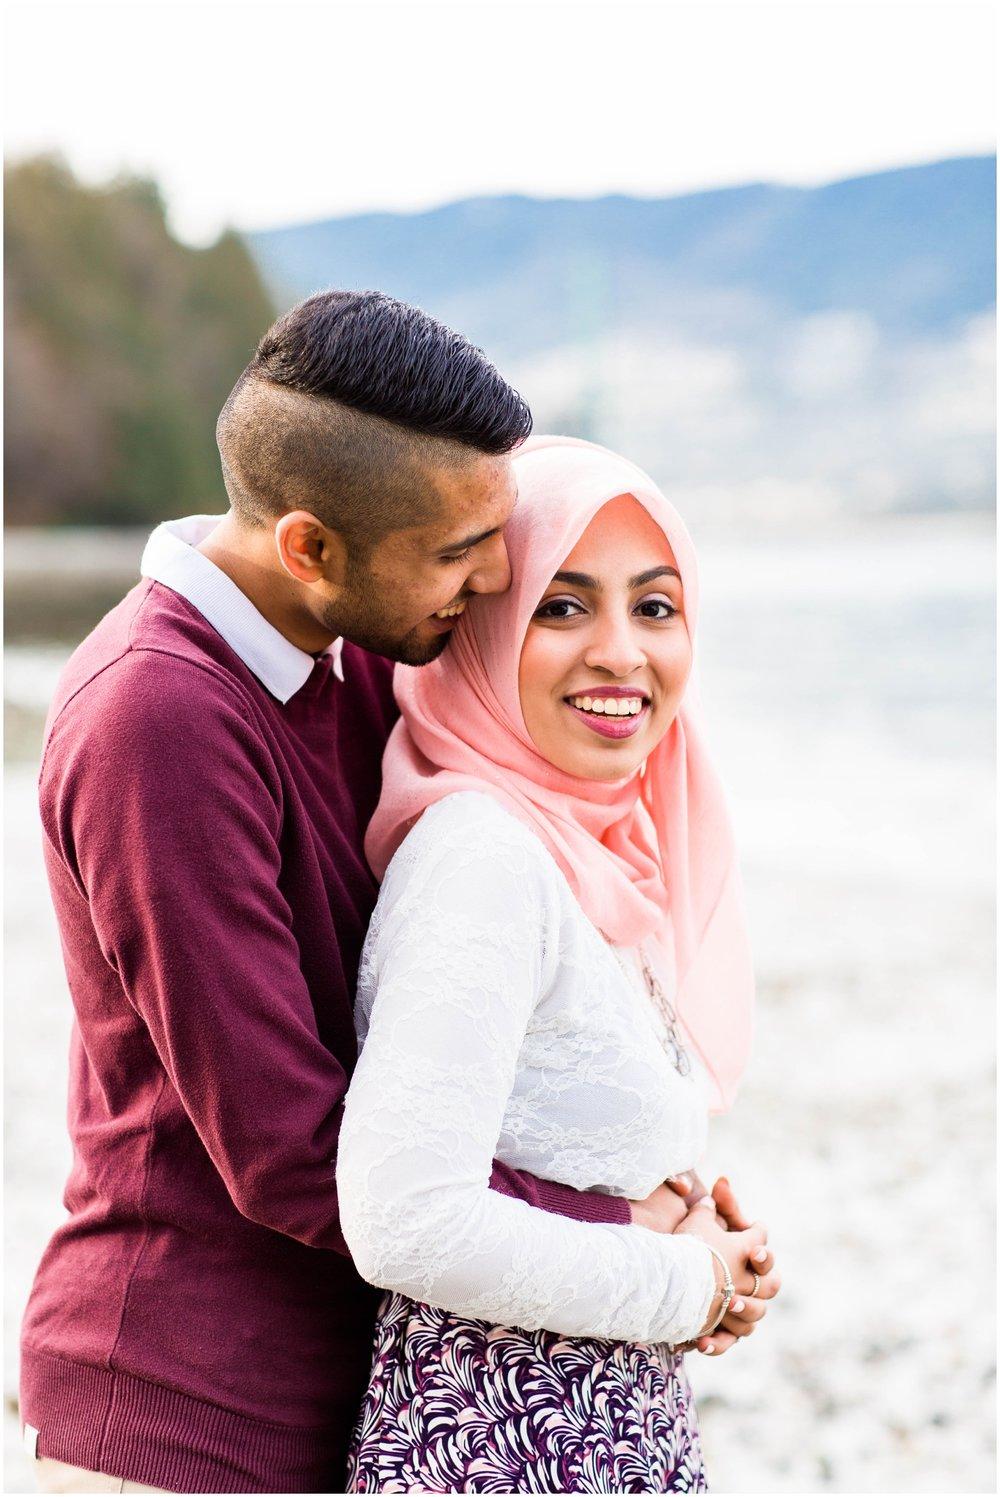 Stanley-Park-Engagement-Vancouver-Toronto-Mississauga-GTA-Pakistani-Indian-Wedding-Photography-Photographer_0085.jpg